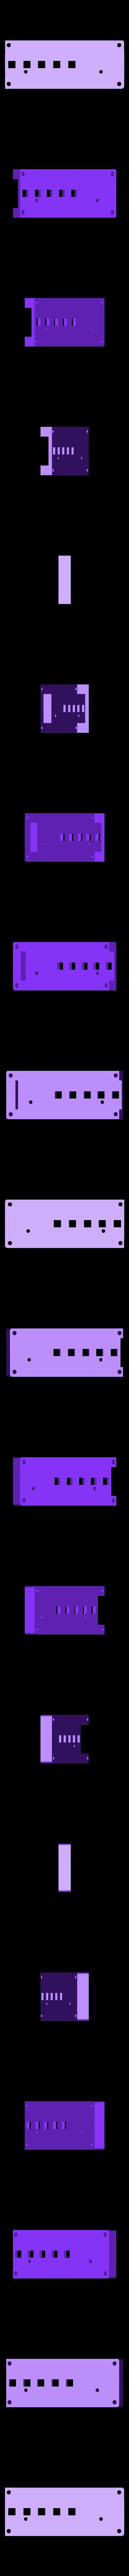 lcd1920x1200front-1.STL Download free STL file LCD controller case V29, V59 • 3D printer object, victor999